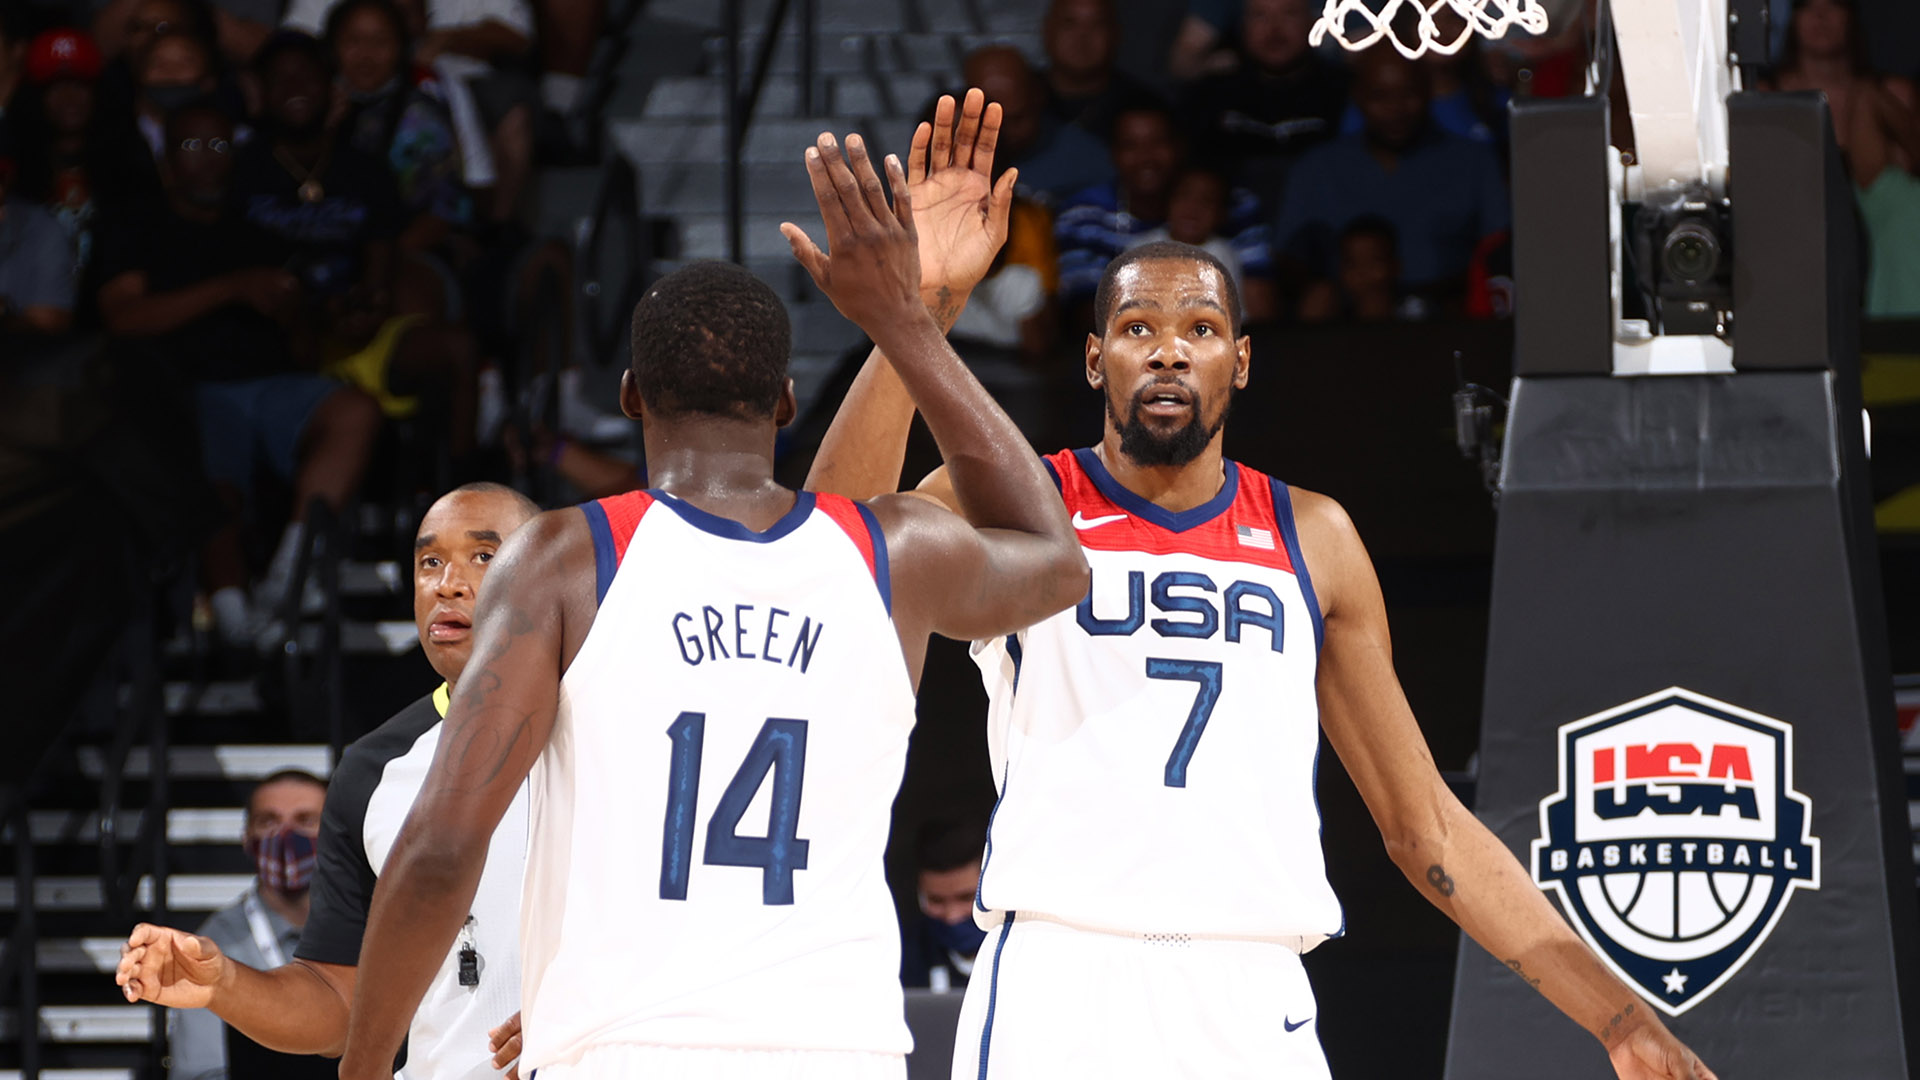 Olympic men's basketball quarterfinal matchups set: US draws Spain